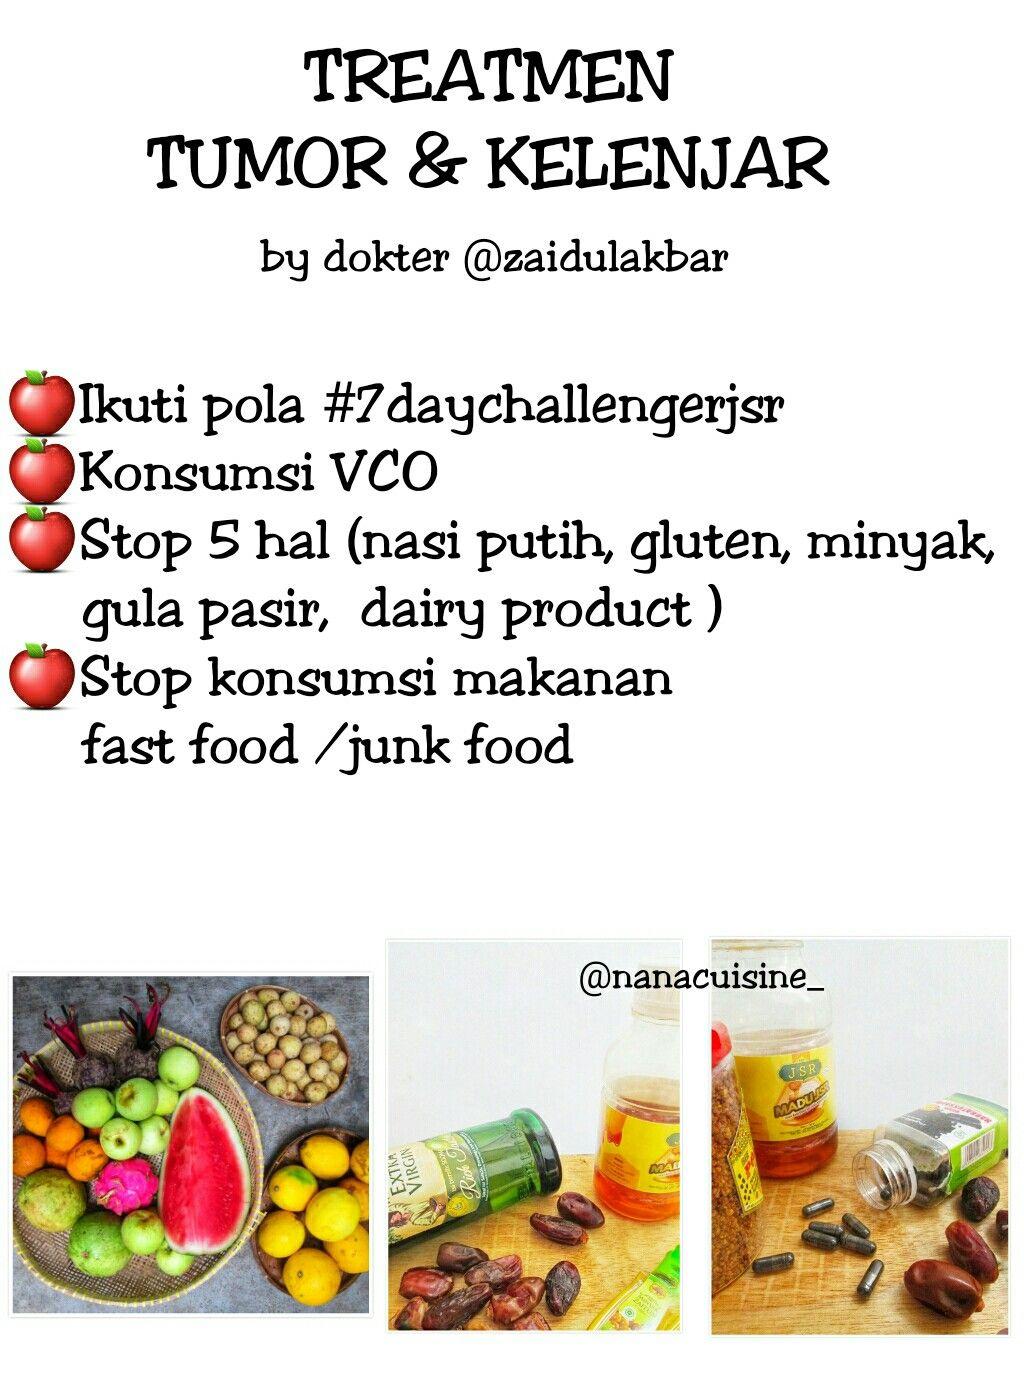 Pin Oleh Manina Mw Di Resep Jsr Resep Diet Sehat Resep Sehat Resep Diet